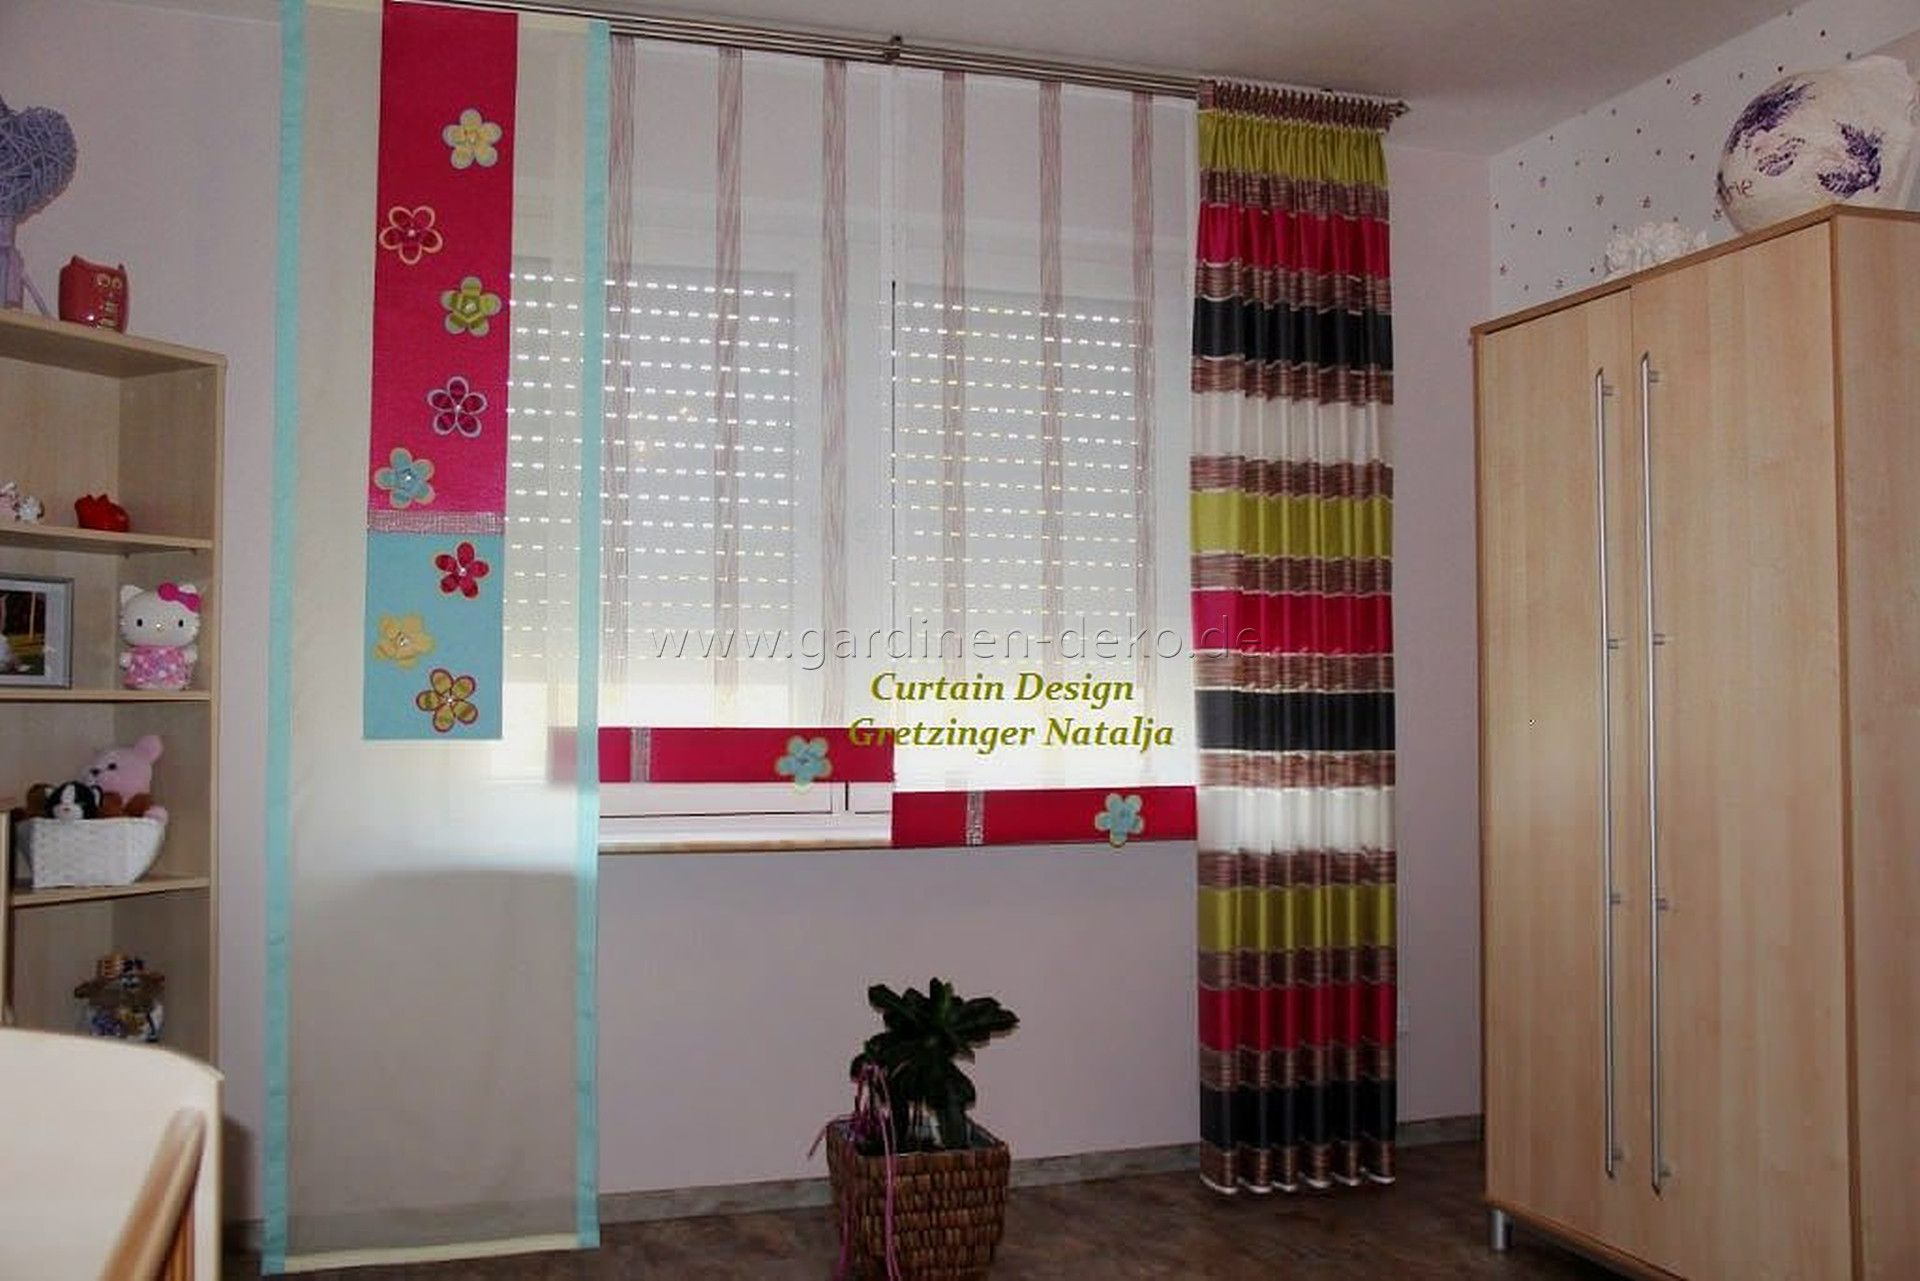 Gretzinger Fensterdeko | ВКонтакте | шторы,гардины,покрывала,подушки ...